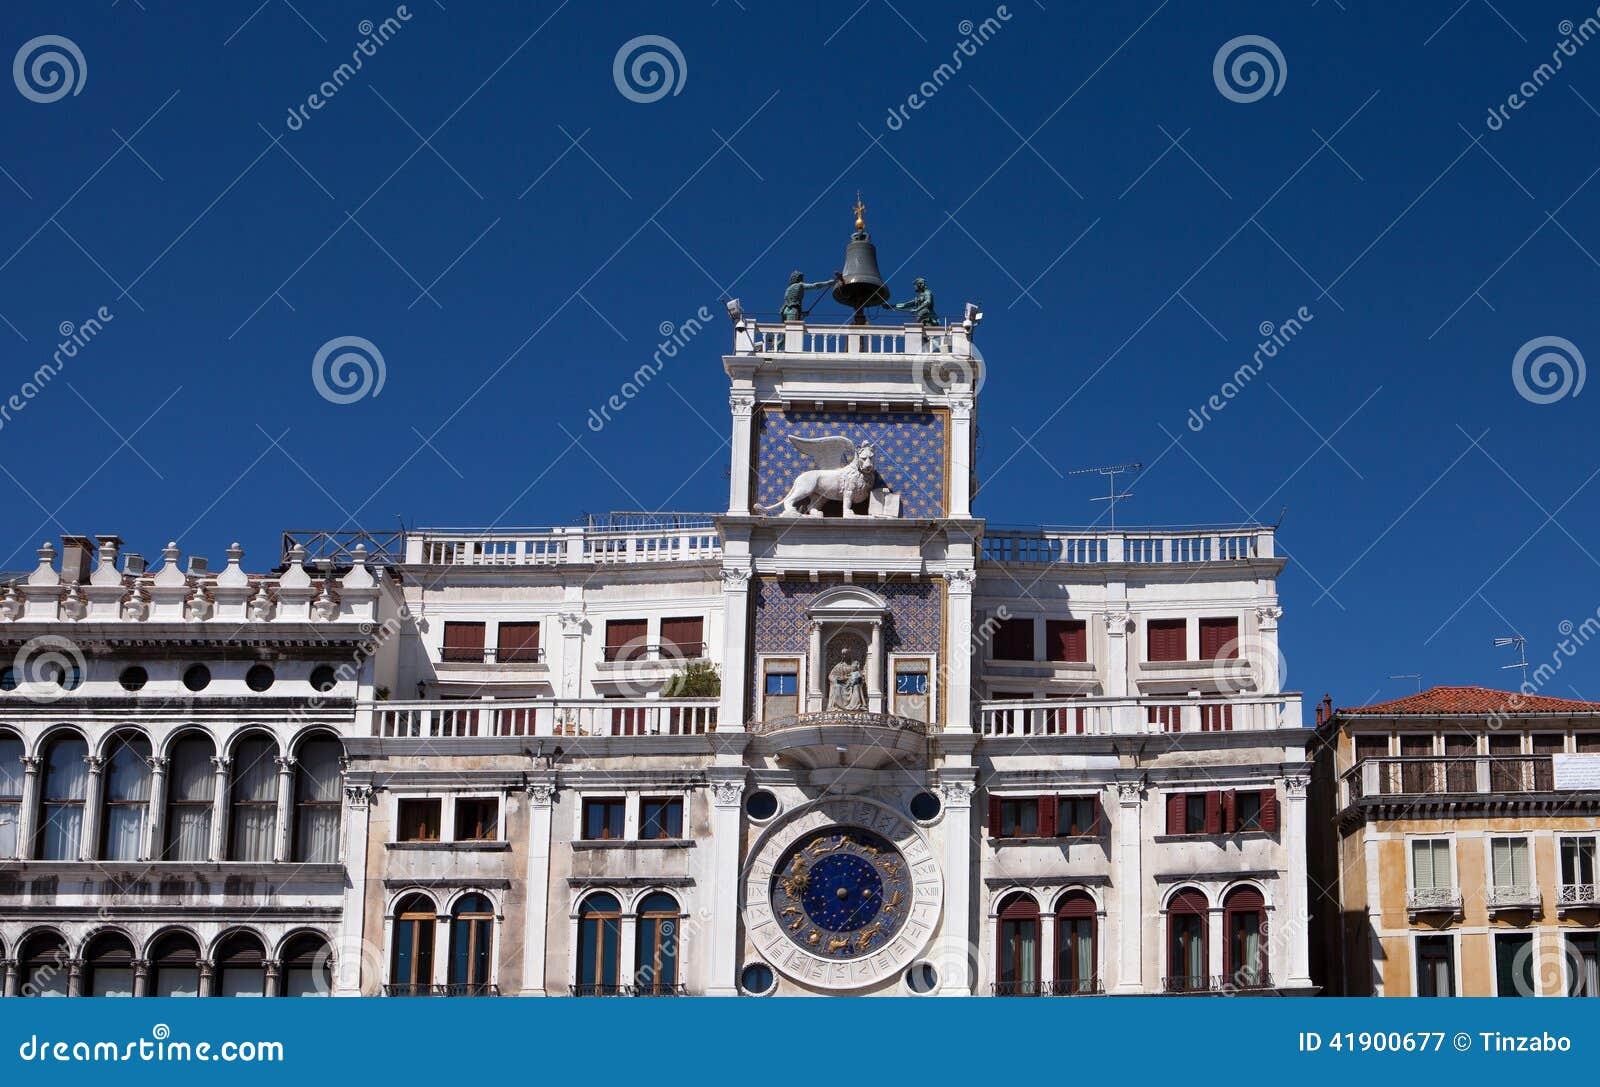 Italia del norte, Venecia, torre de reloj Plaza de San Marcos de St Mark, adornada con la escultura de leones cons alas